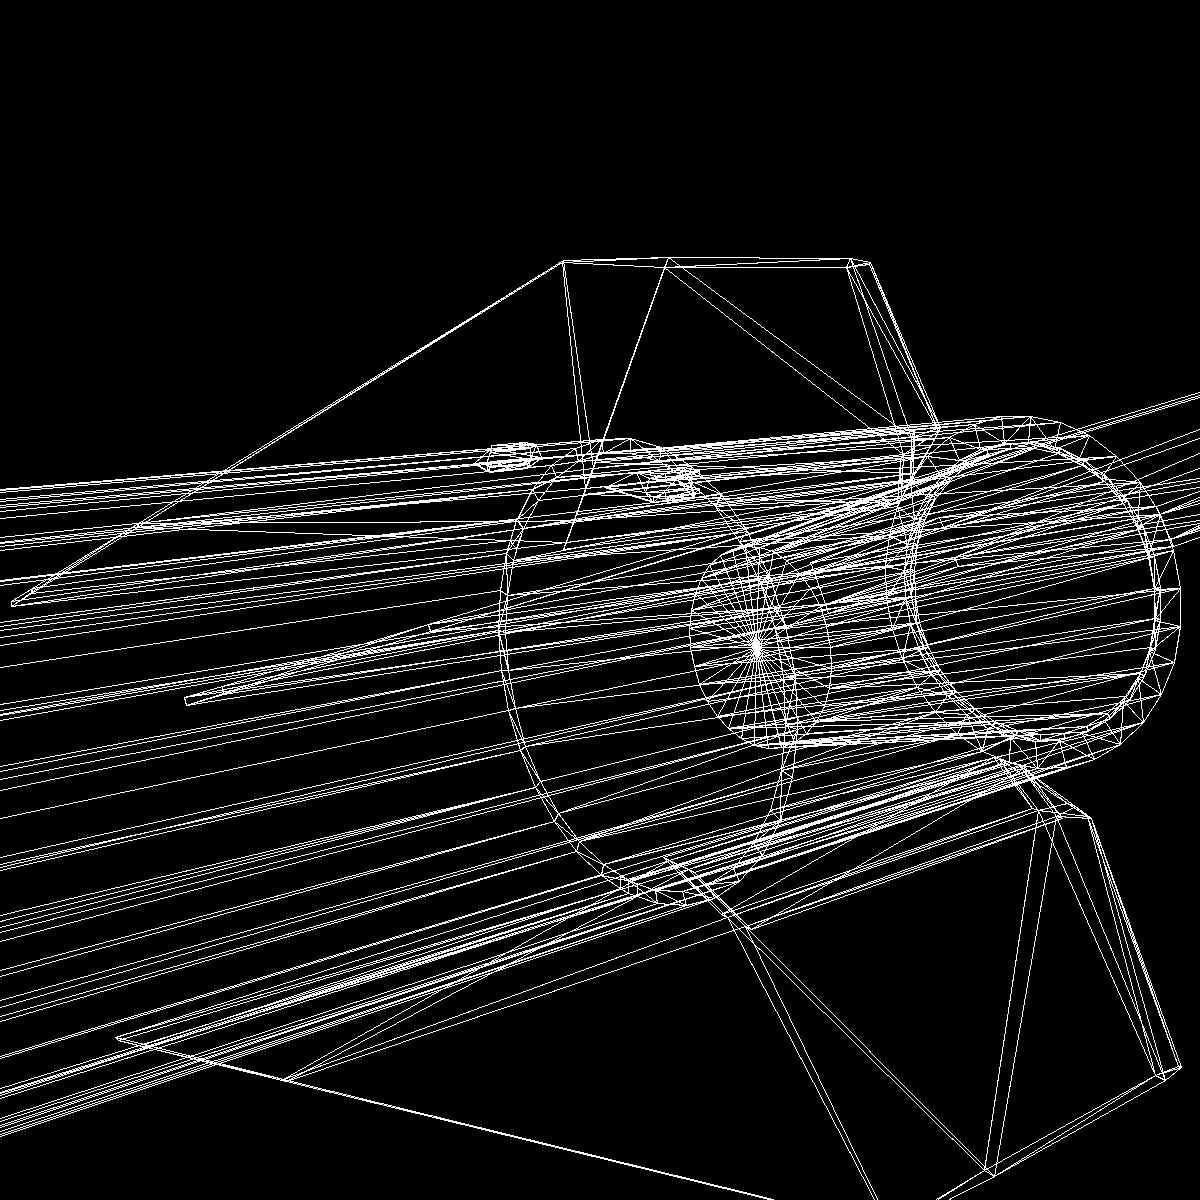 black brant vb sounding rocket 3d model 3ds dxf cob x obj 150885